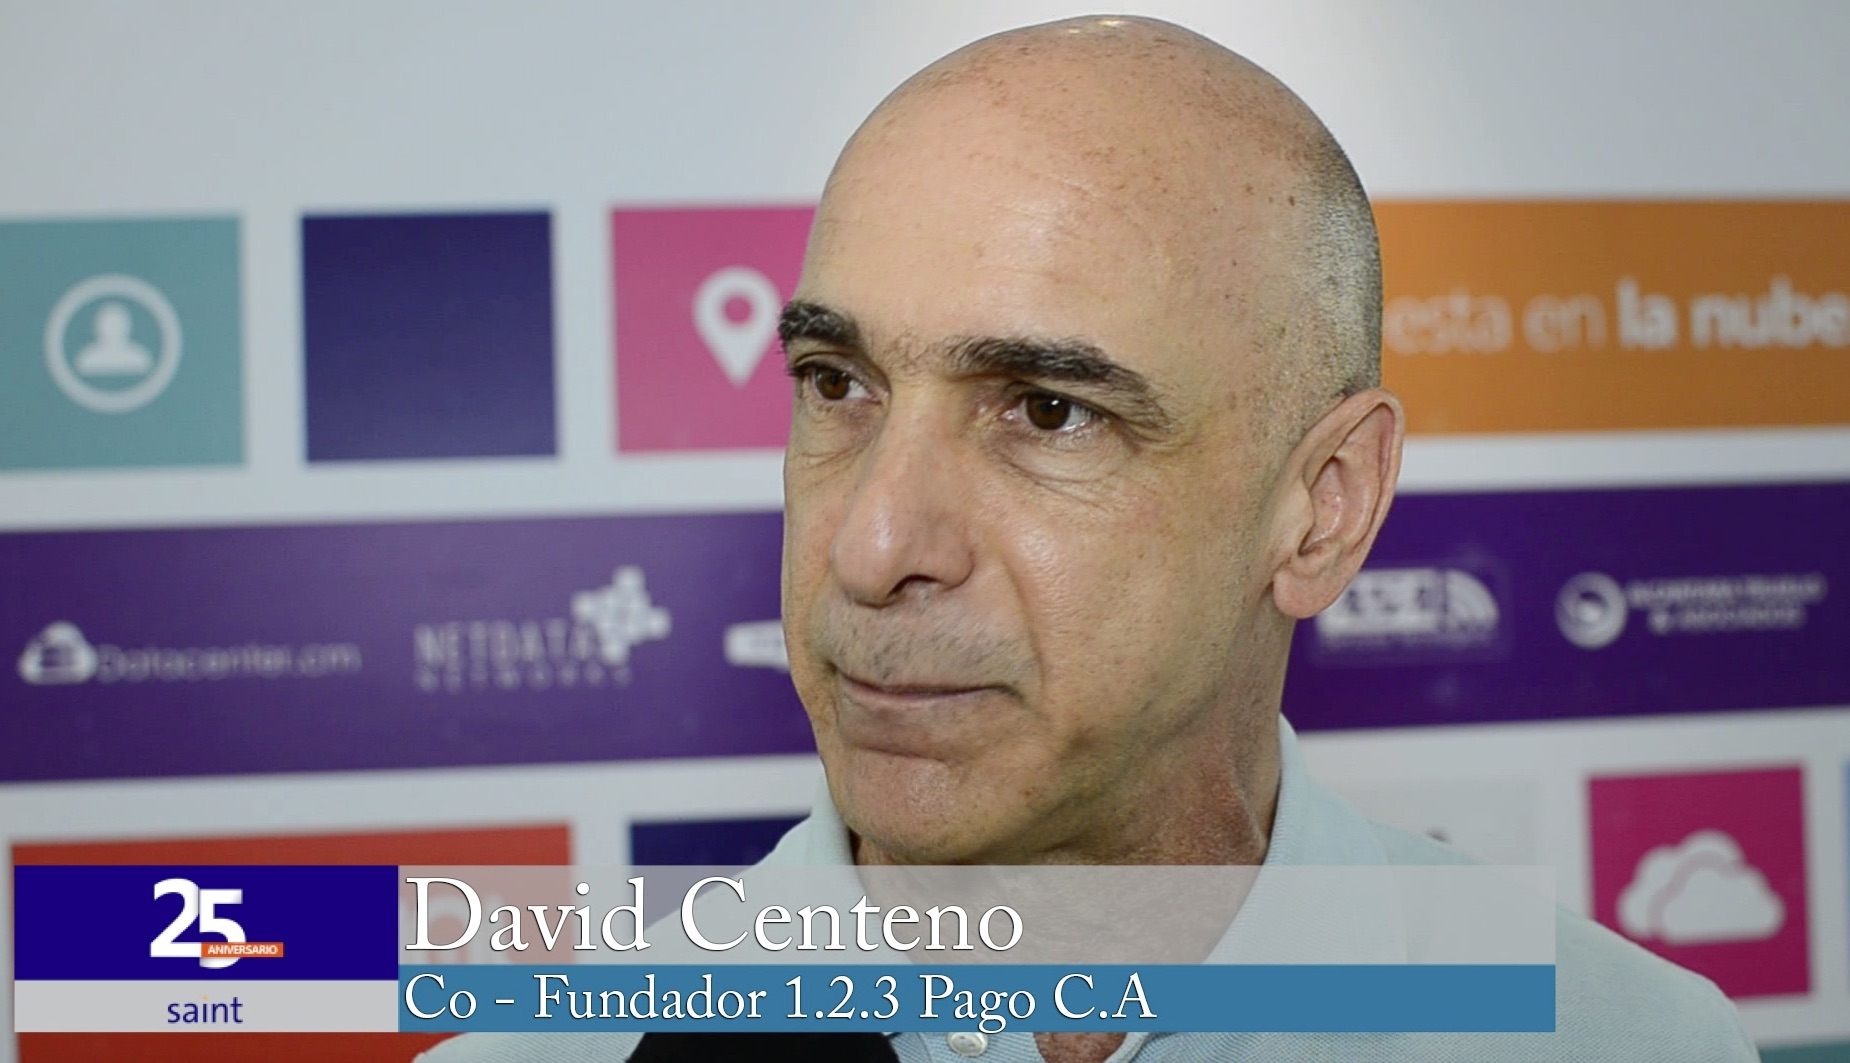 David Centeno, Cofundador 123, Pago C.A.